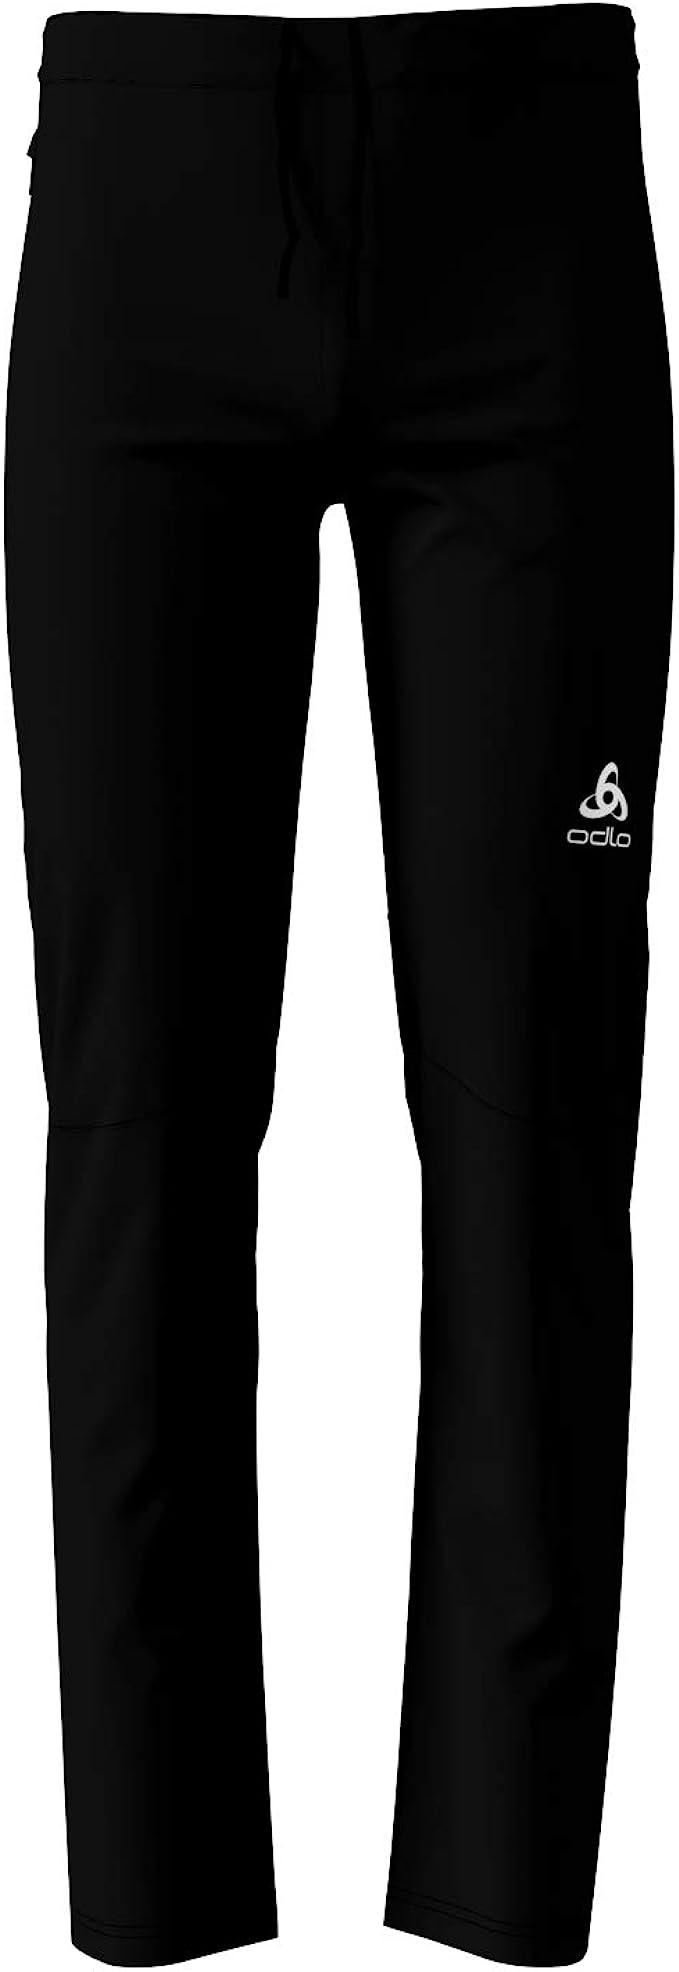 black Odlo Pants AEOLUS ELEMENT WARM 622232